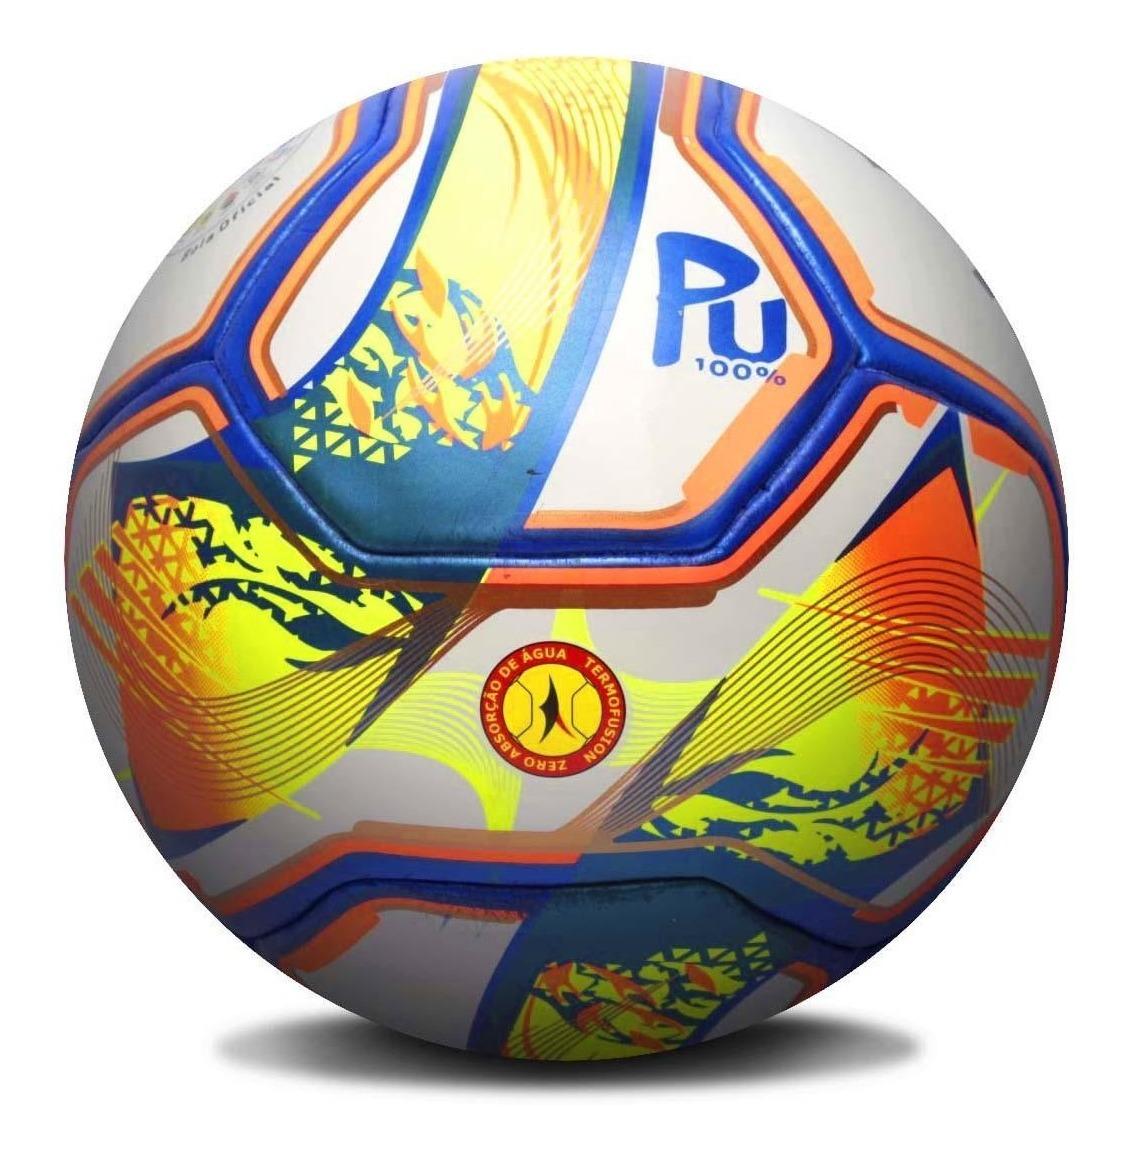 80453b7d1308b Bola Futsal Kagiva F5 Brasil Oficial X 2019 - R$ 139,90 em Mercado Livre